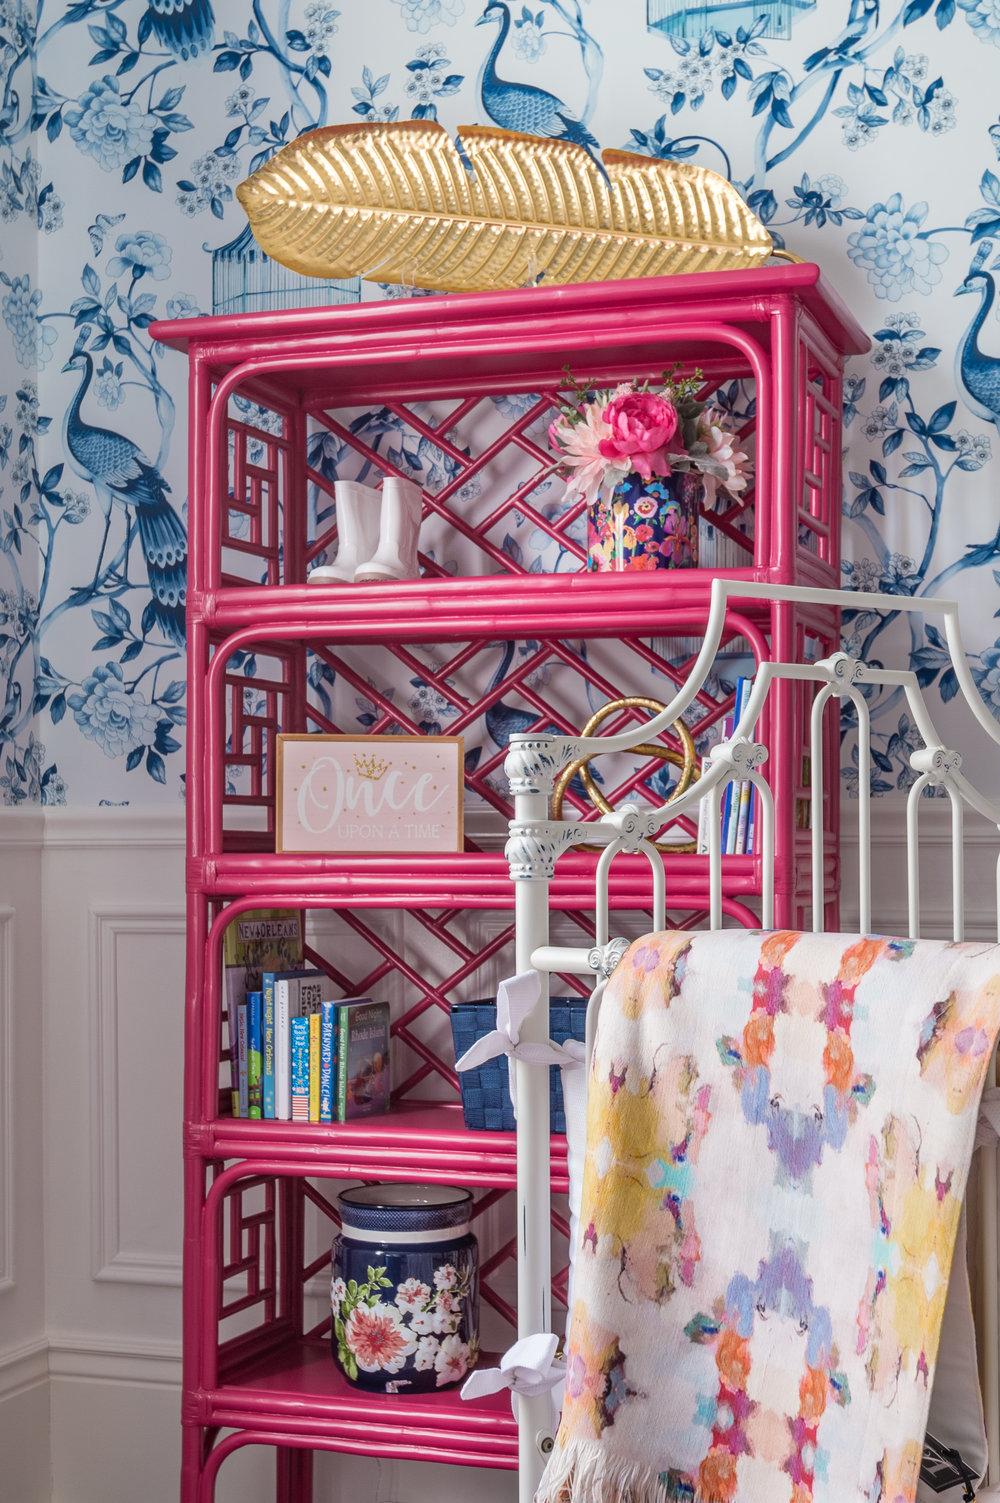 painted bamboo shelf decor new orleans interiors khb interiors